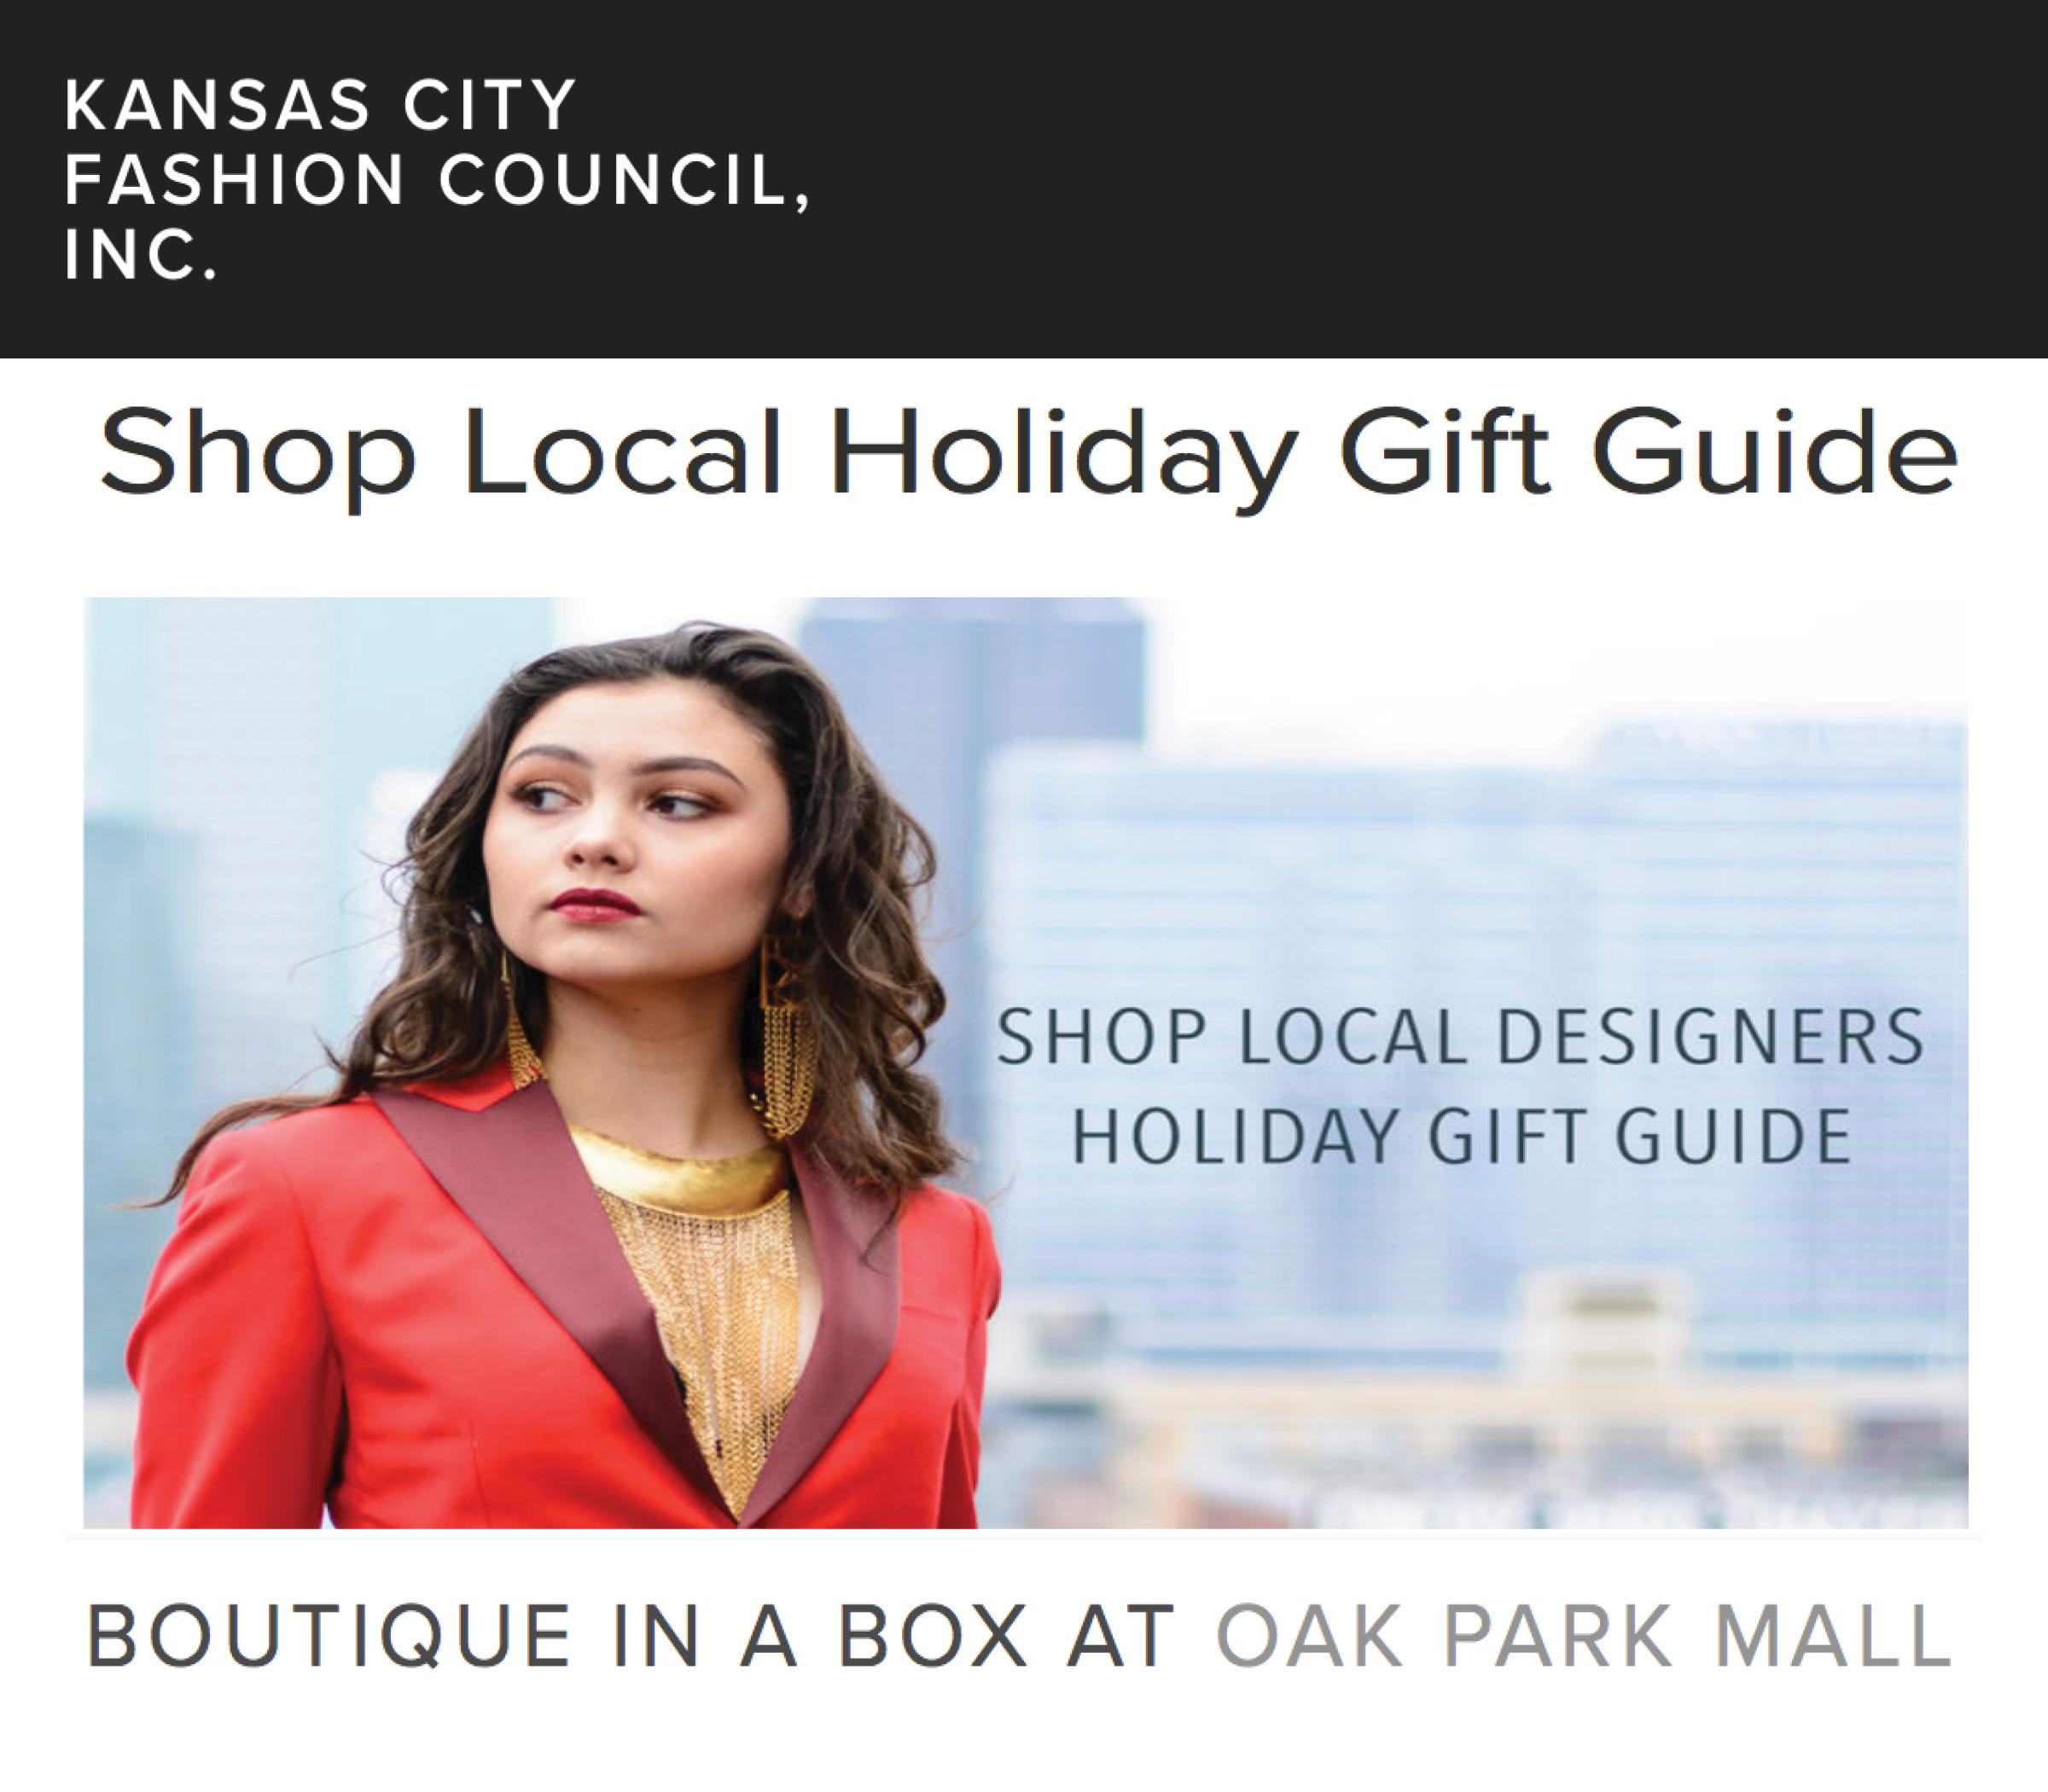 KC Fashion Council Holiday Shopping Guide.jpg